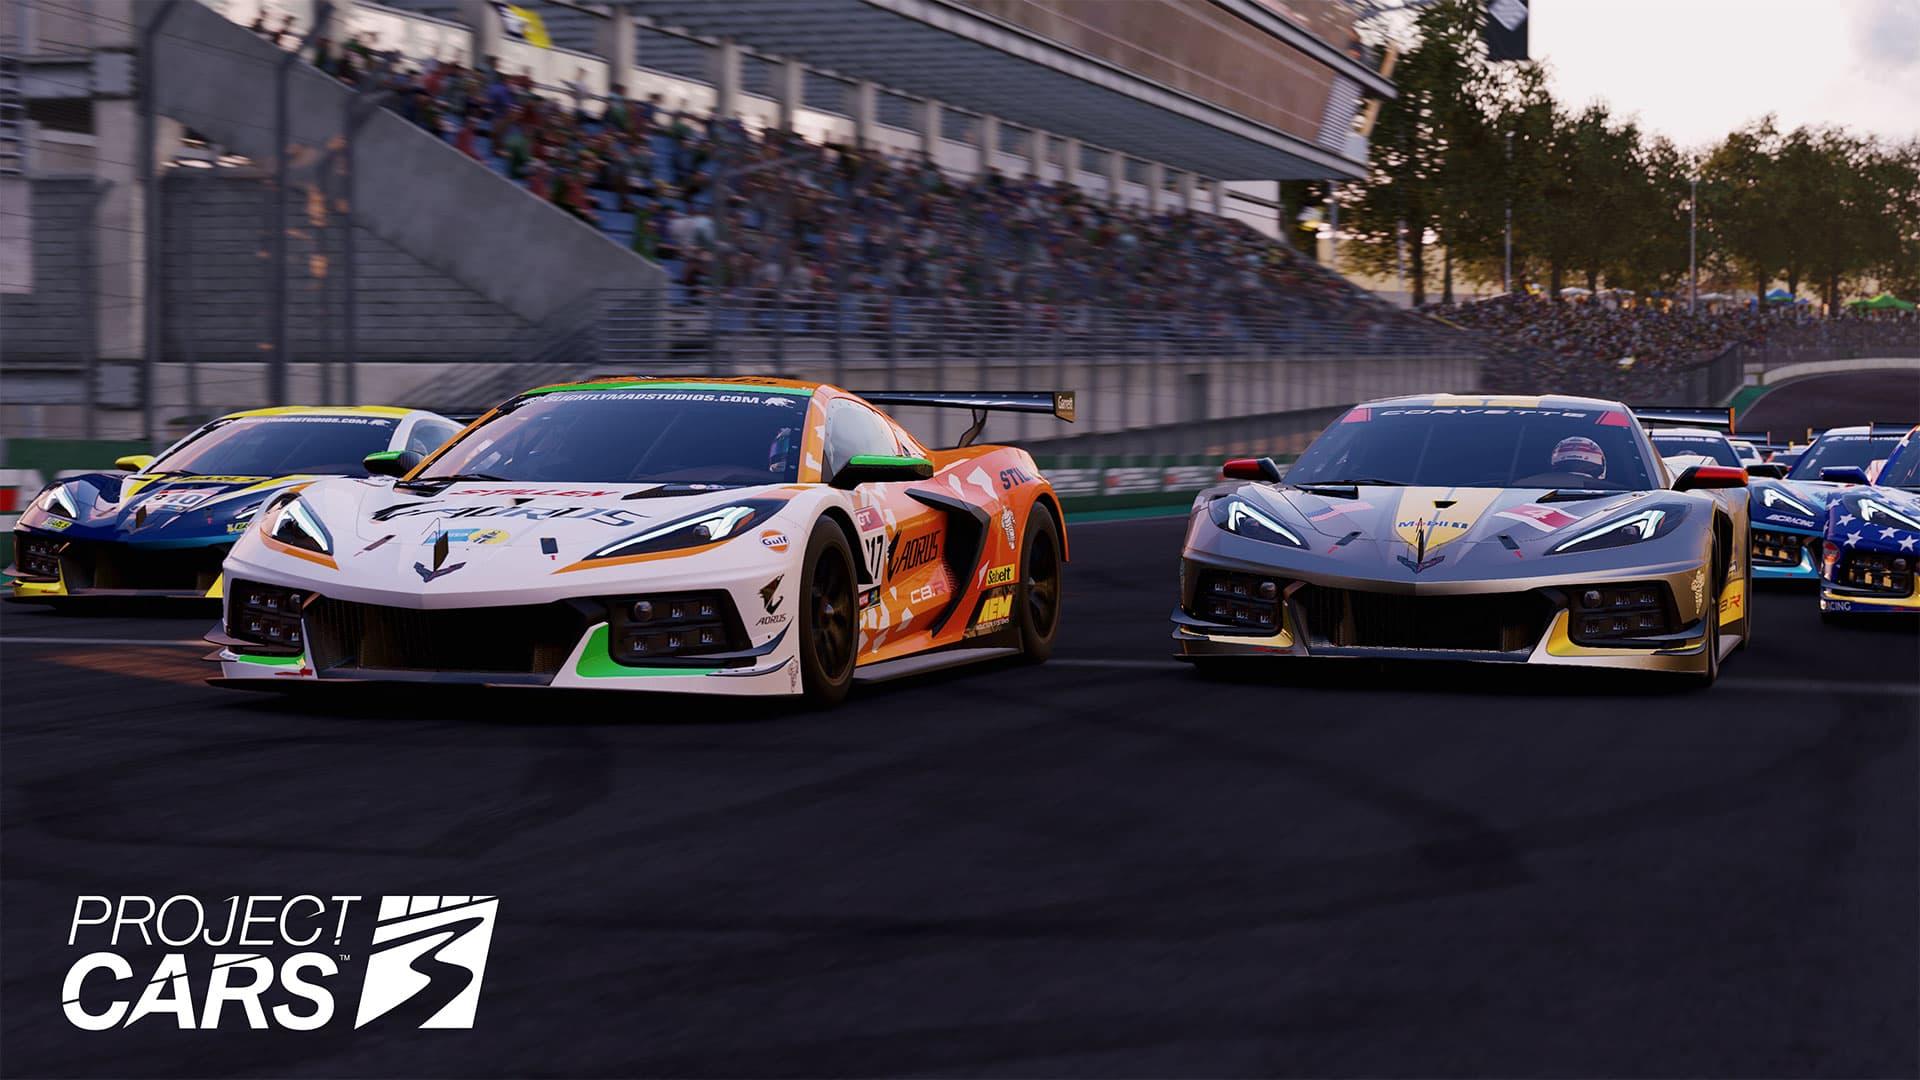 Tanggal Rilis Game Project CARS 3 Sudah Ditetapkan Bandai